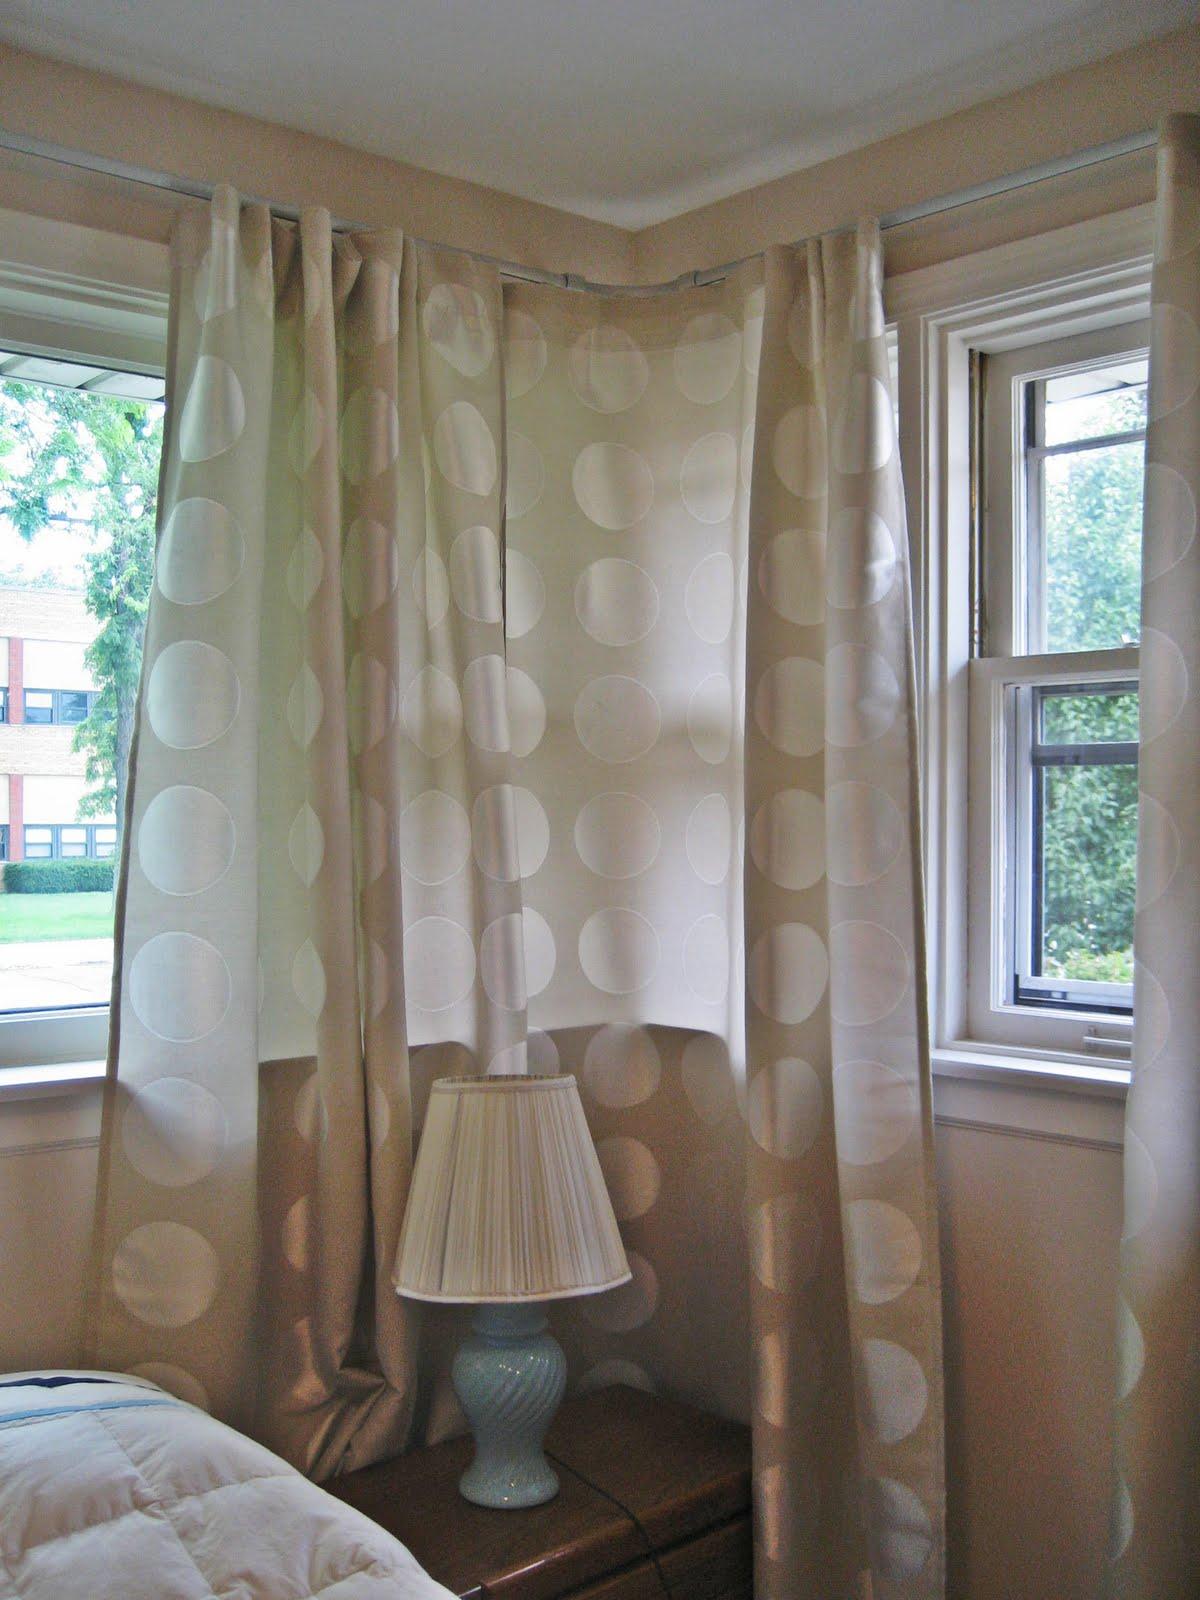 Ikea Kvartal Curtain In 2020: Fiscally Chic